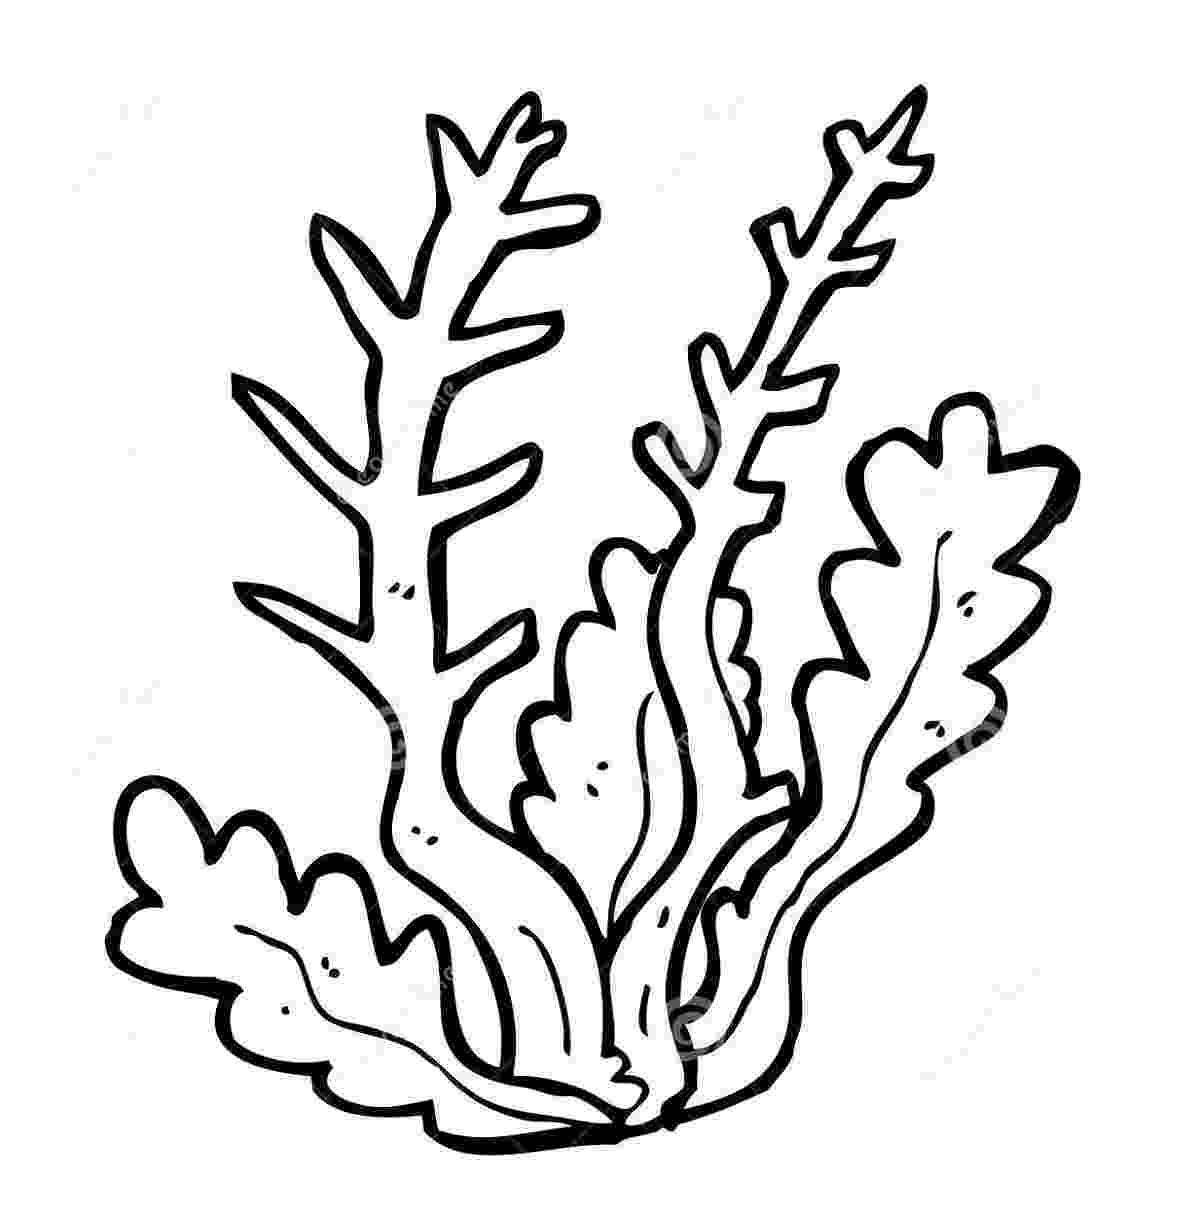 ocean plants coloring pages underwater ocean sea coral bubbles plants printable plants ocean coloring pages